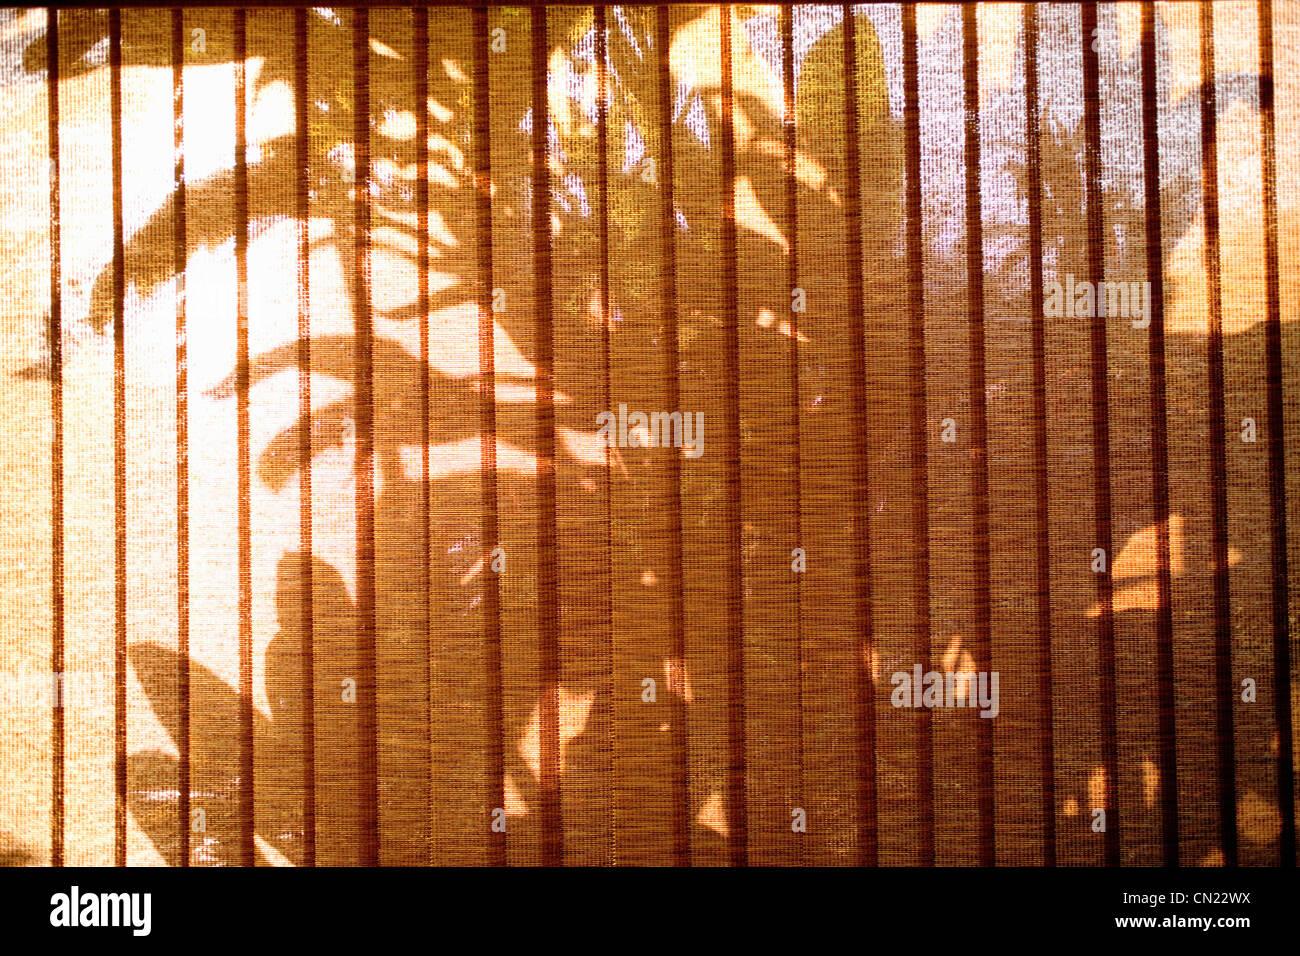 Palm tree shadows seen through window blinds - Stock Image